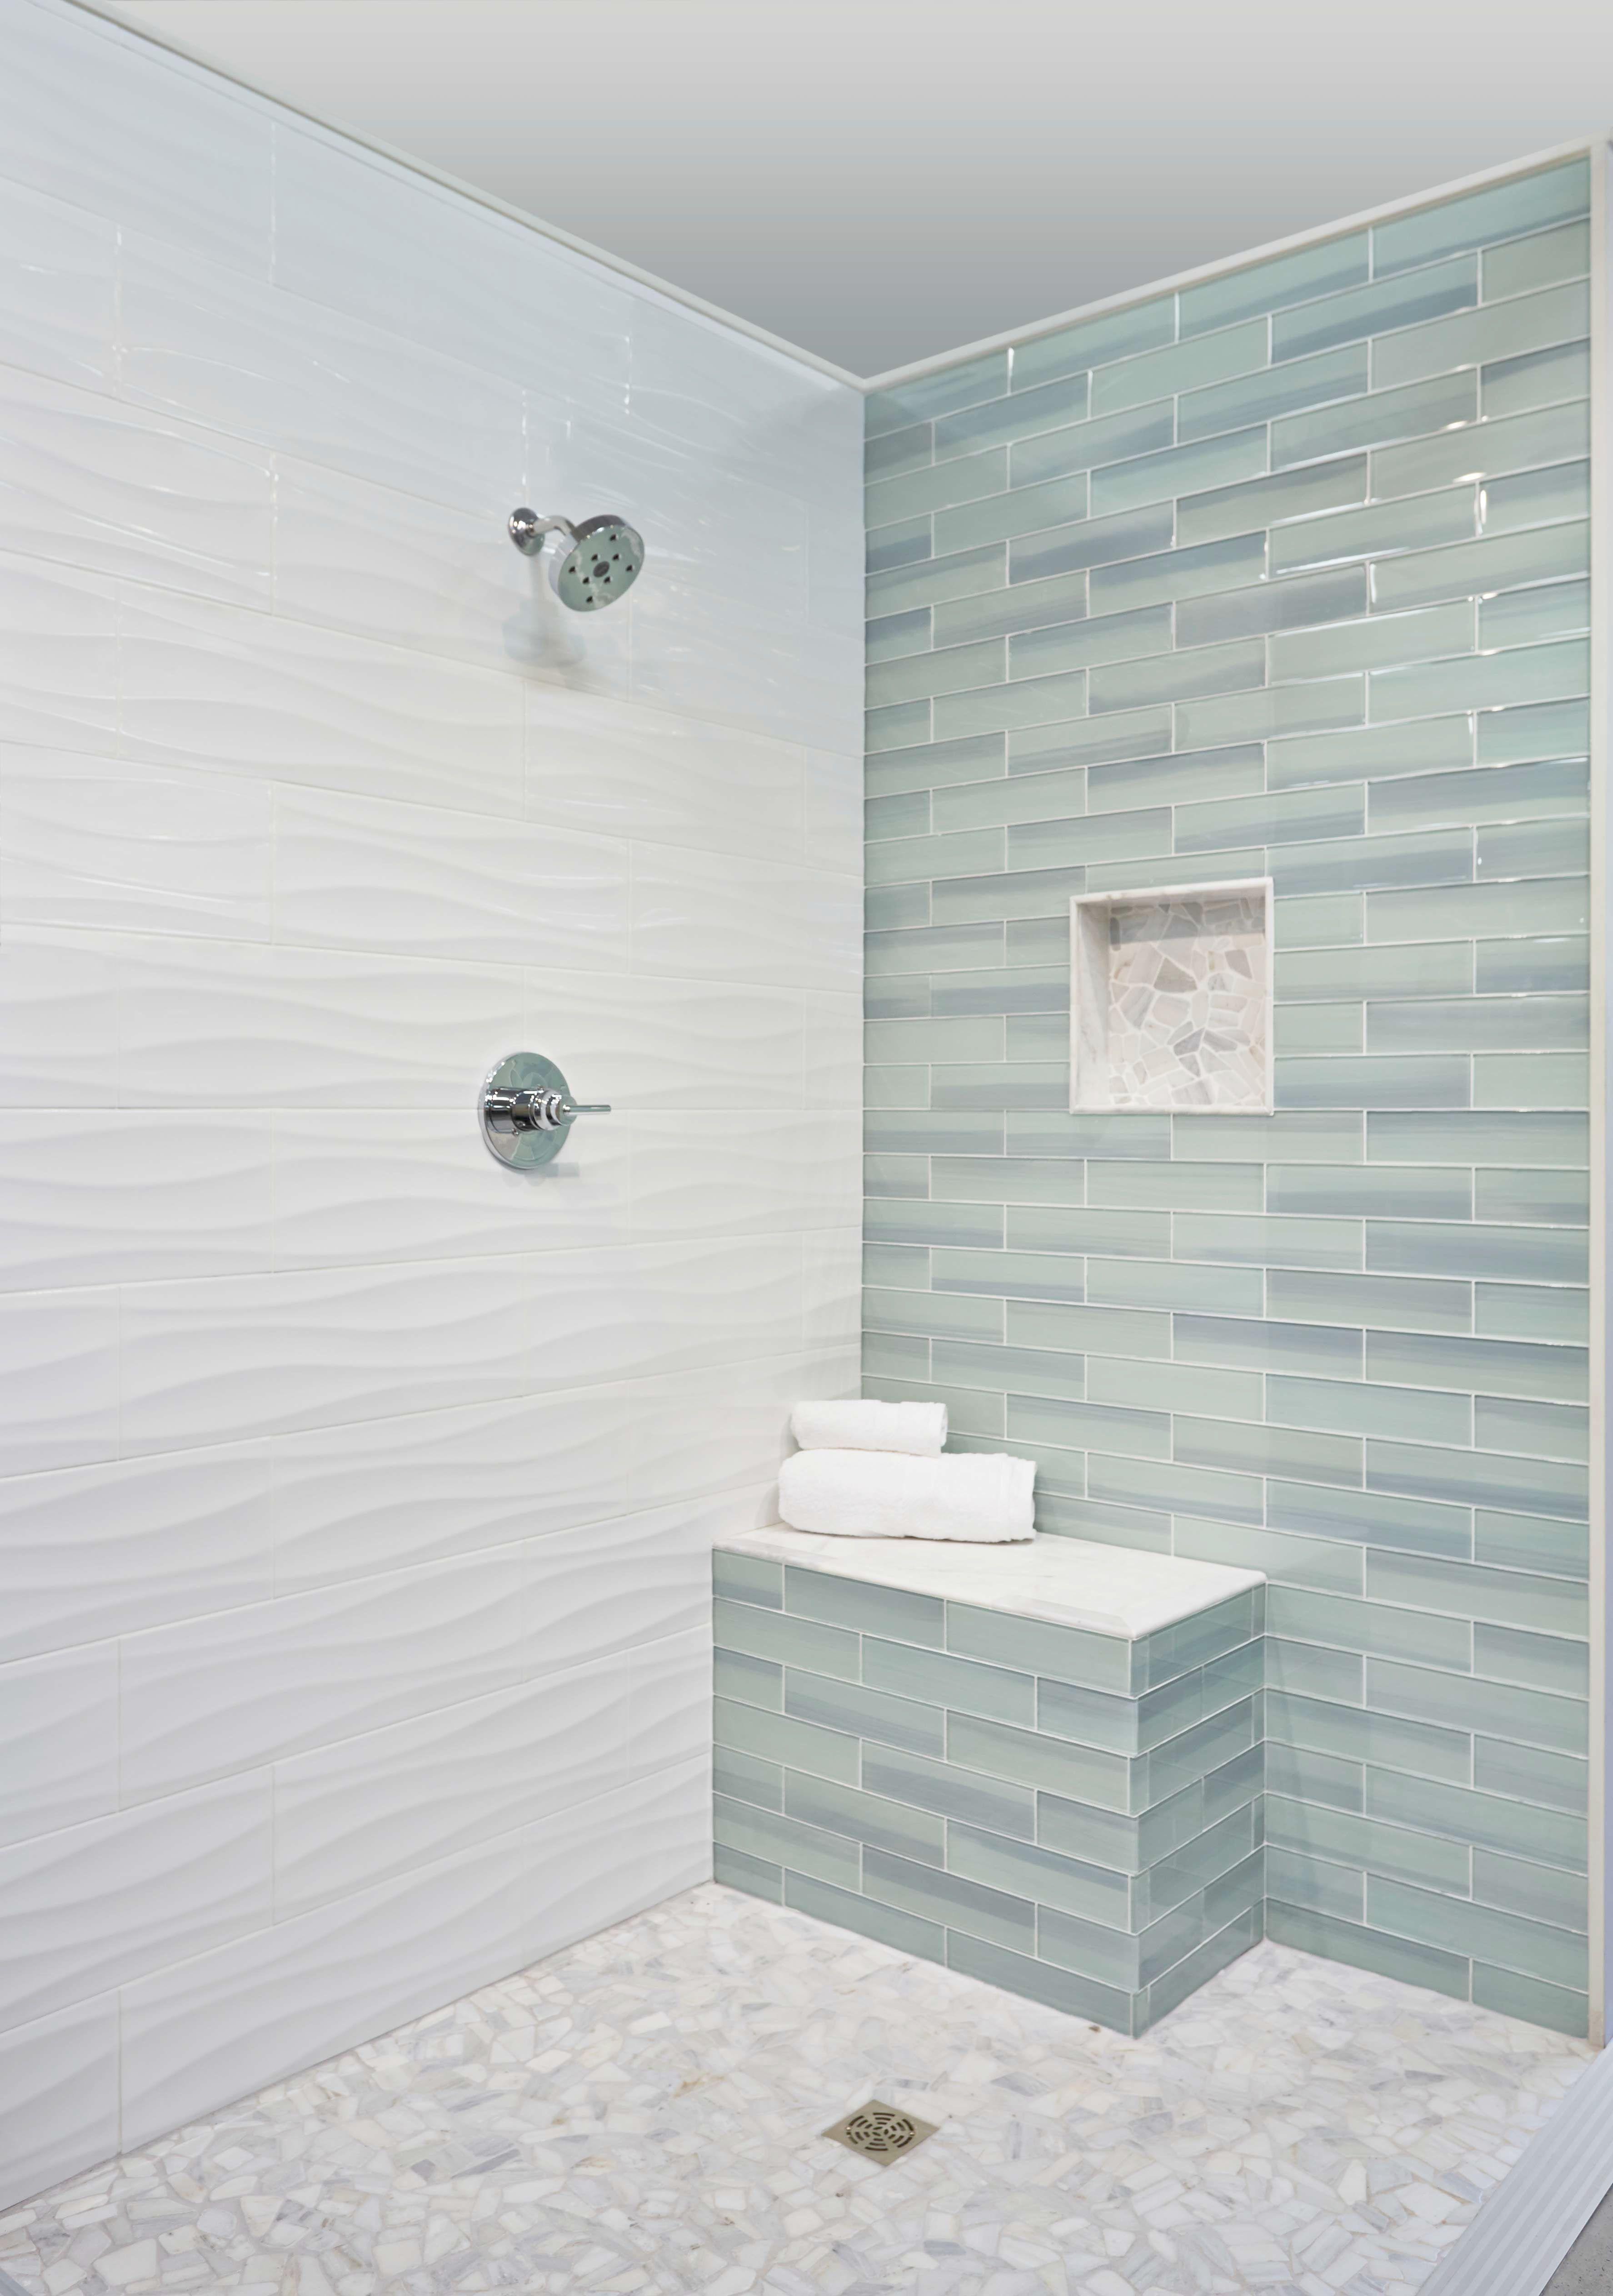 Bathroom Tiles Latest Design Except